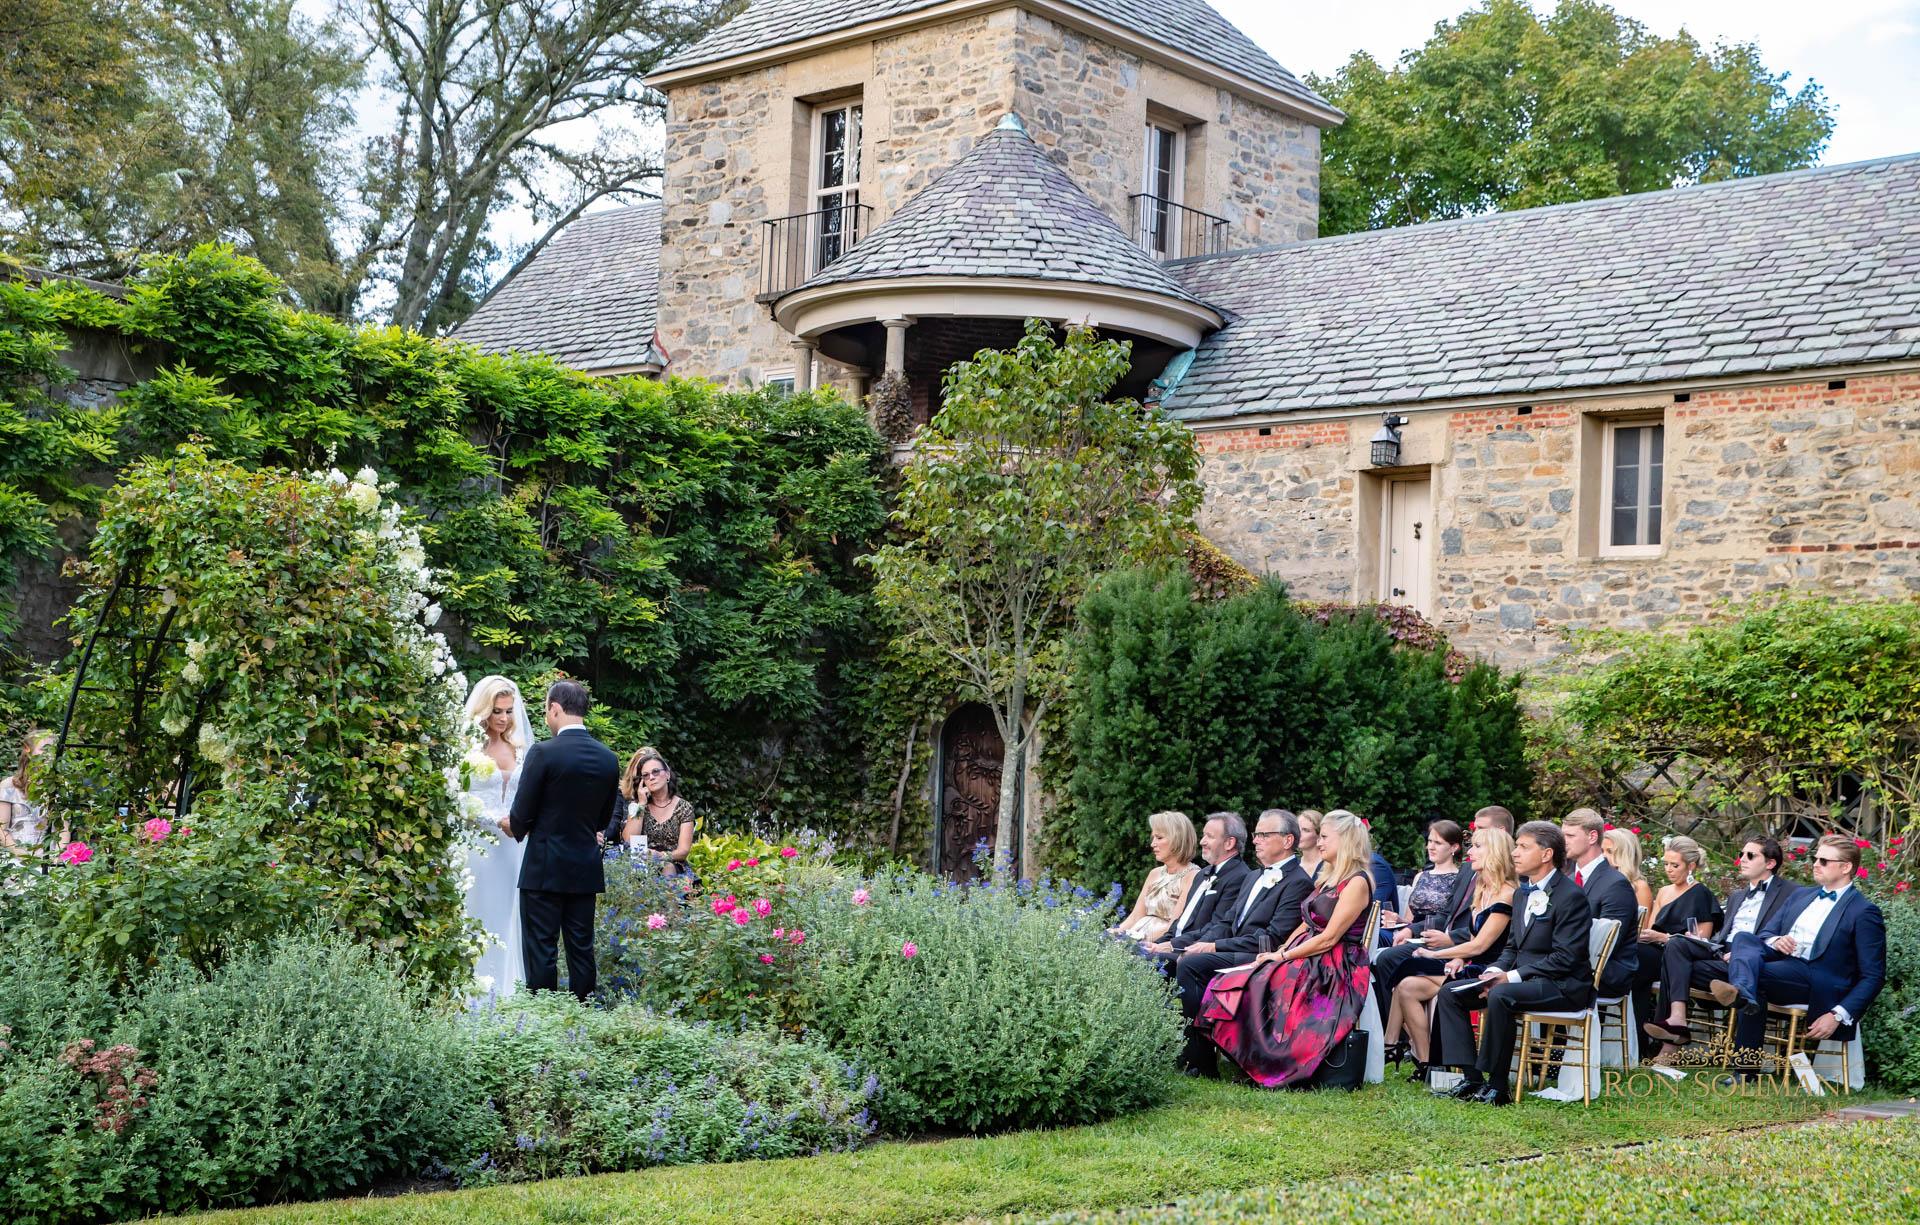 ANDALUSIA ESTATE WEDDING 24